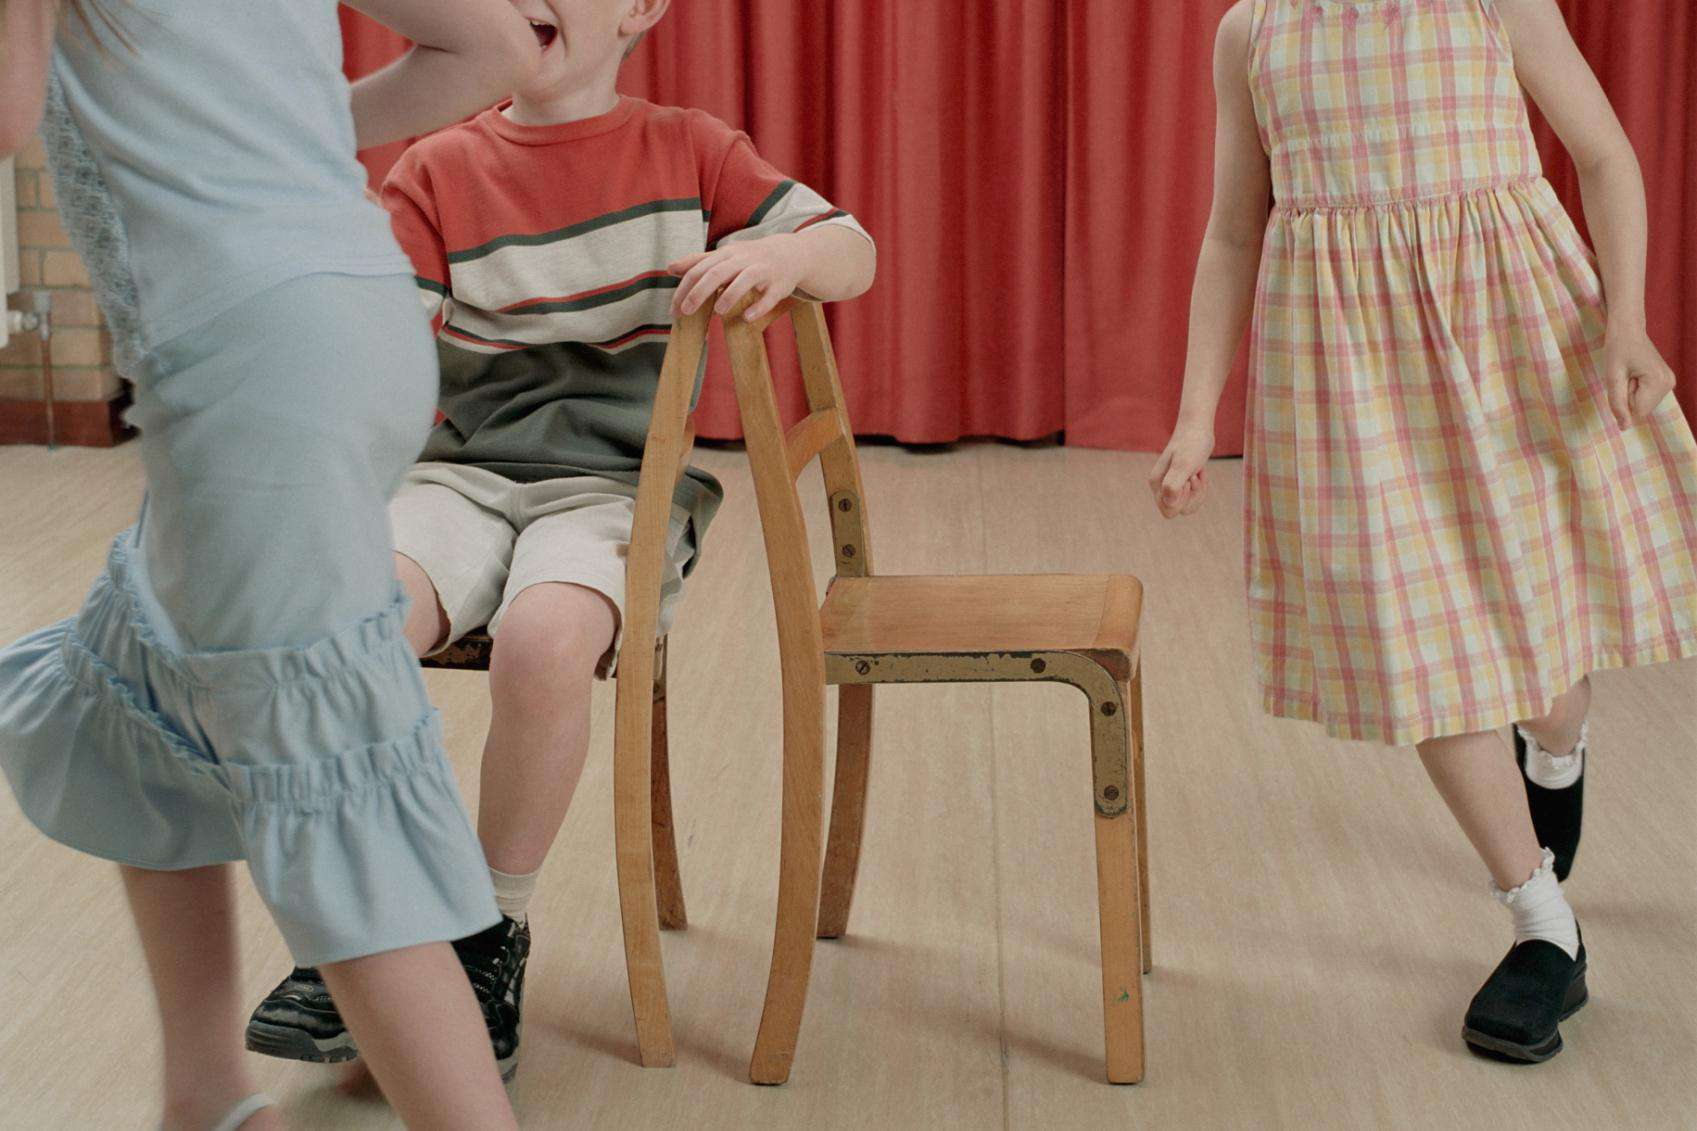 Children Play Musical Chairs